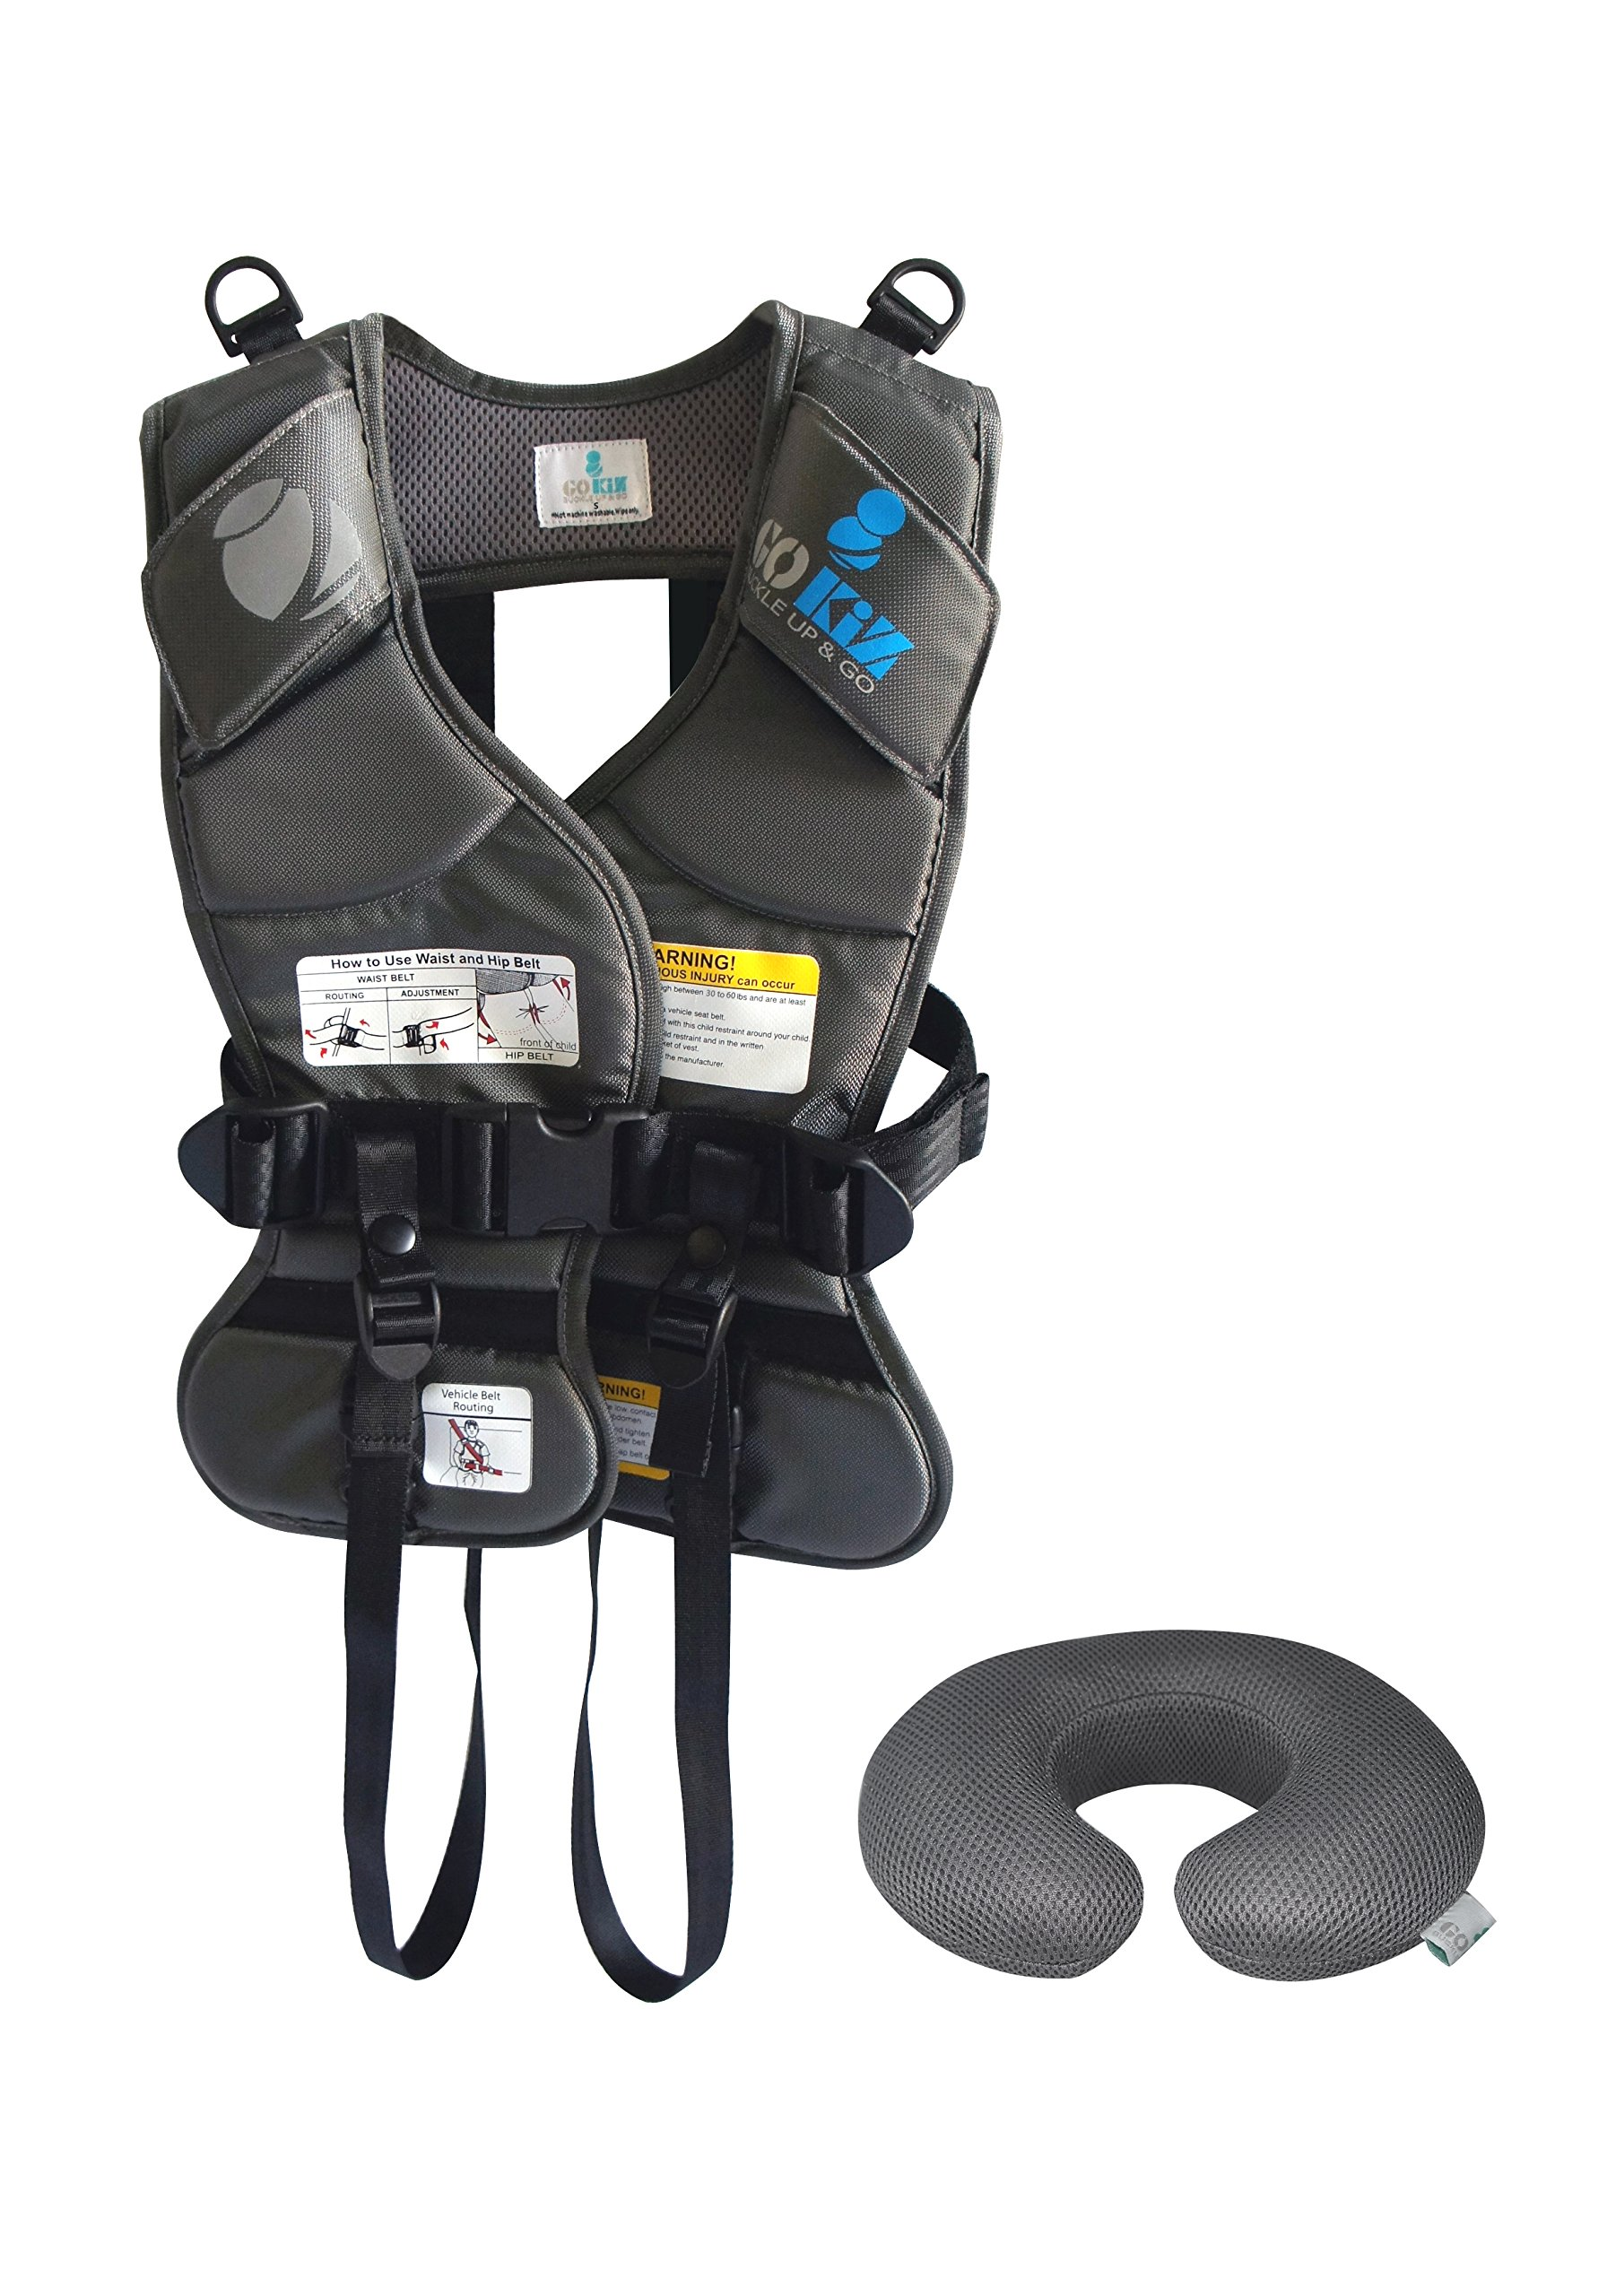 GOKIZ Car Seat Vest, Charcoal, Small